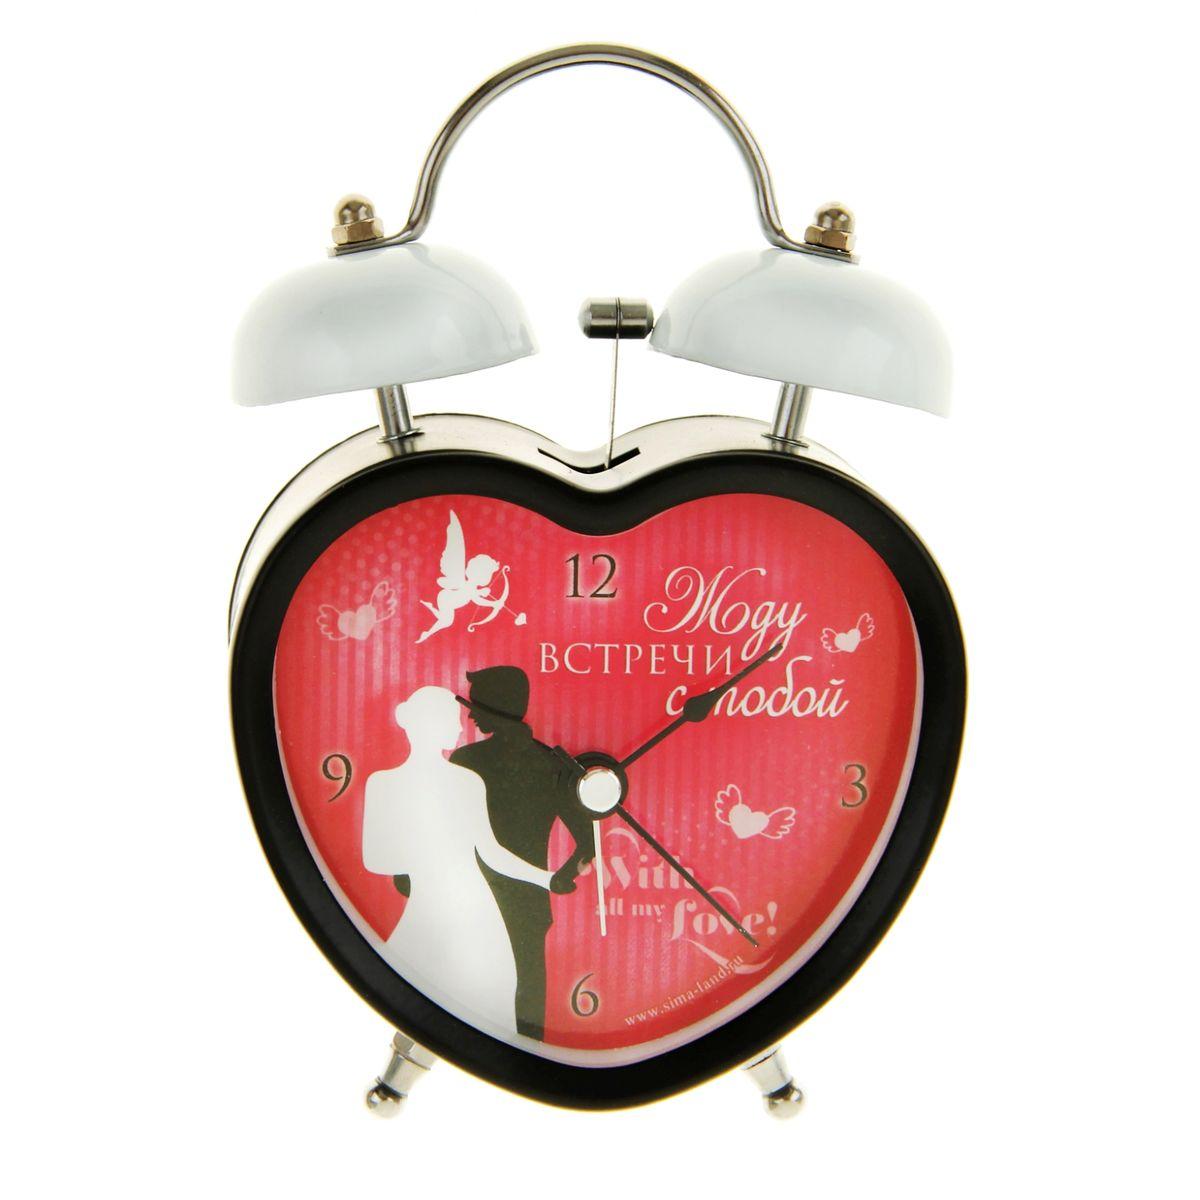 Часы-будильник Sima-land Жду встречи часы будильник sima land жду встречи